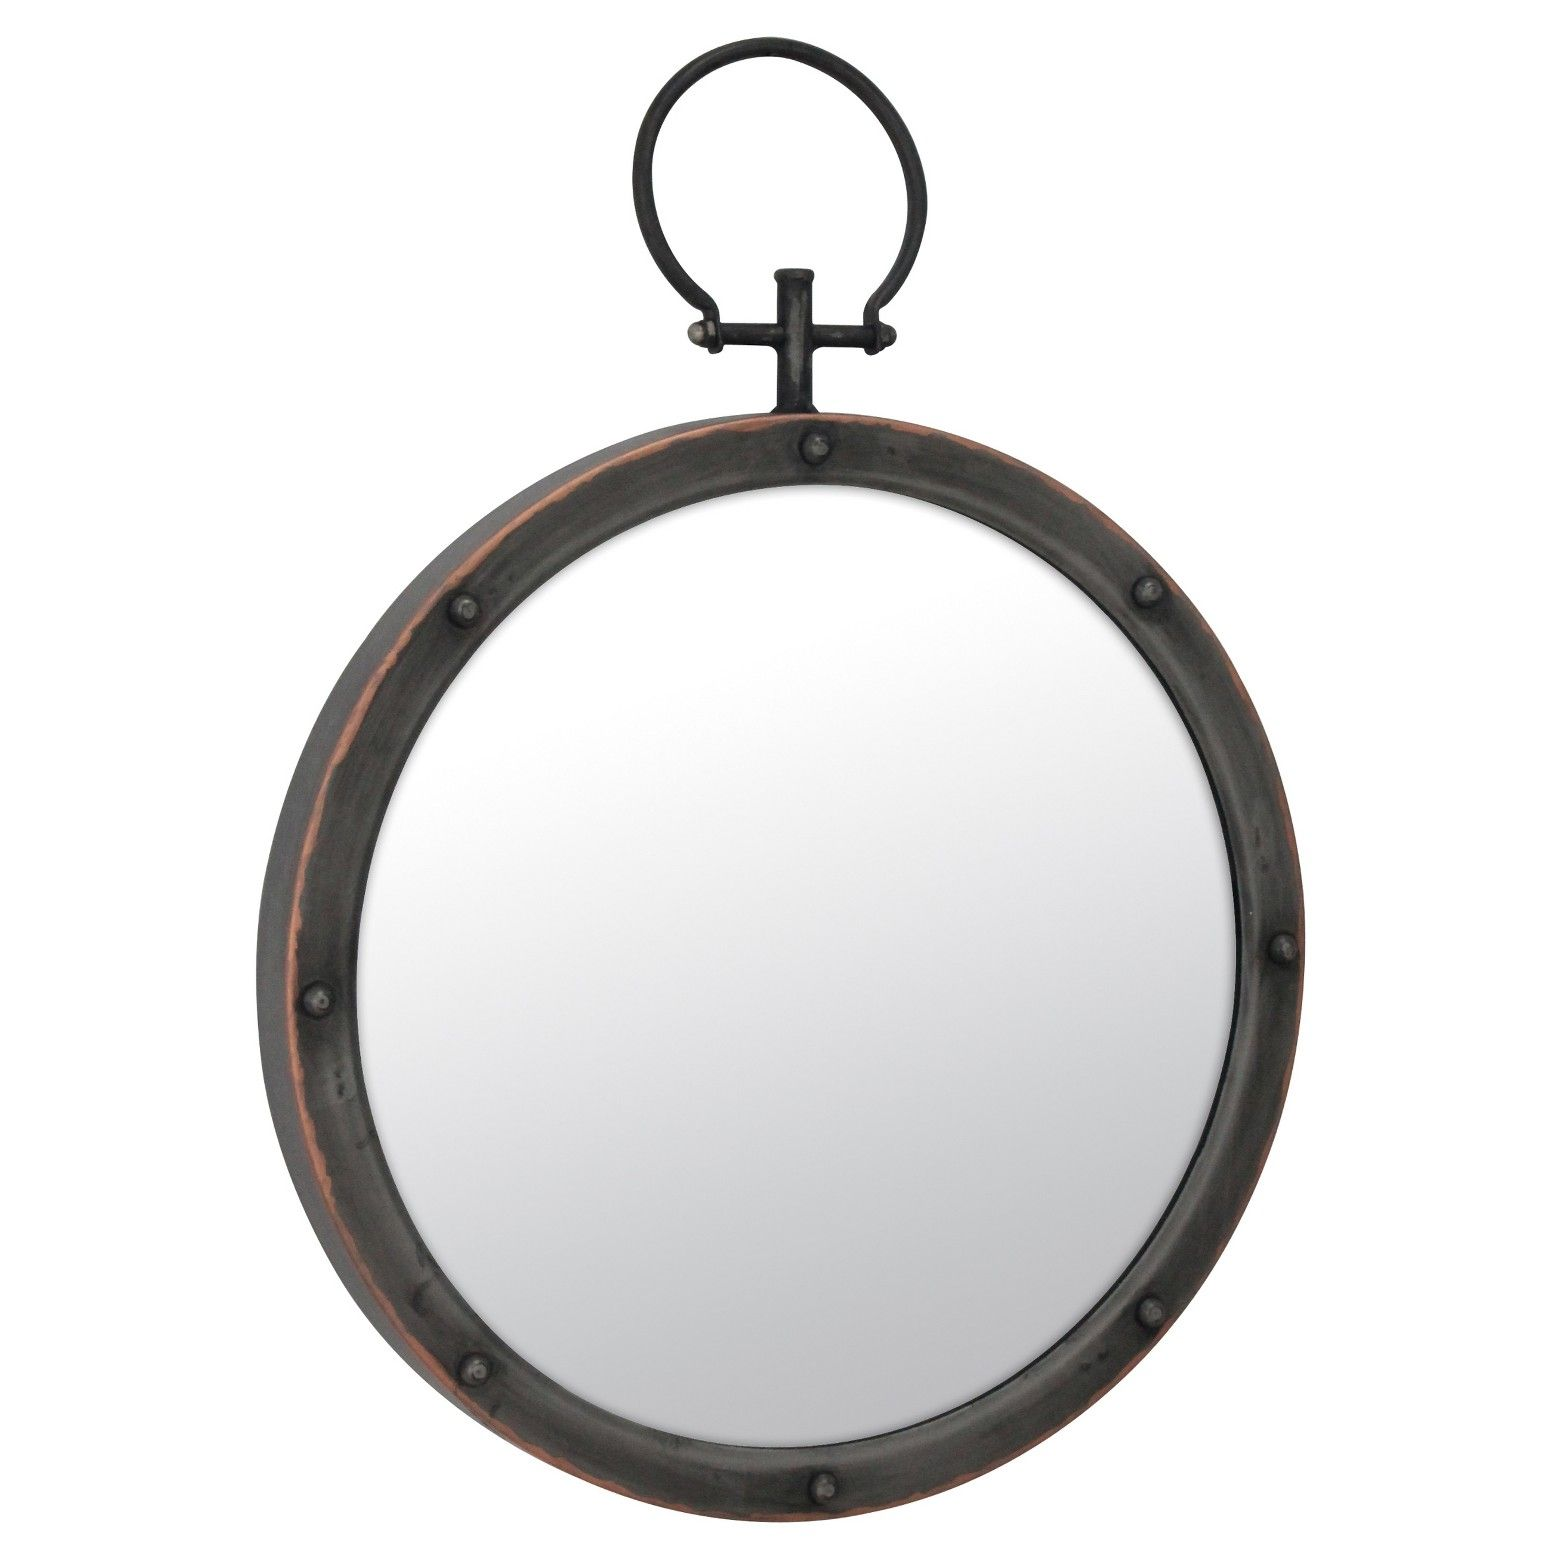 Ckk home decor round wall mirror with ring u rivet trim dark gray